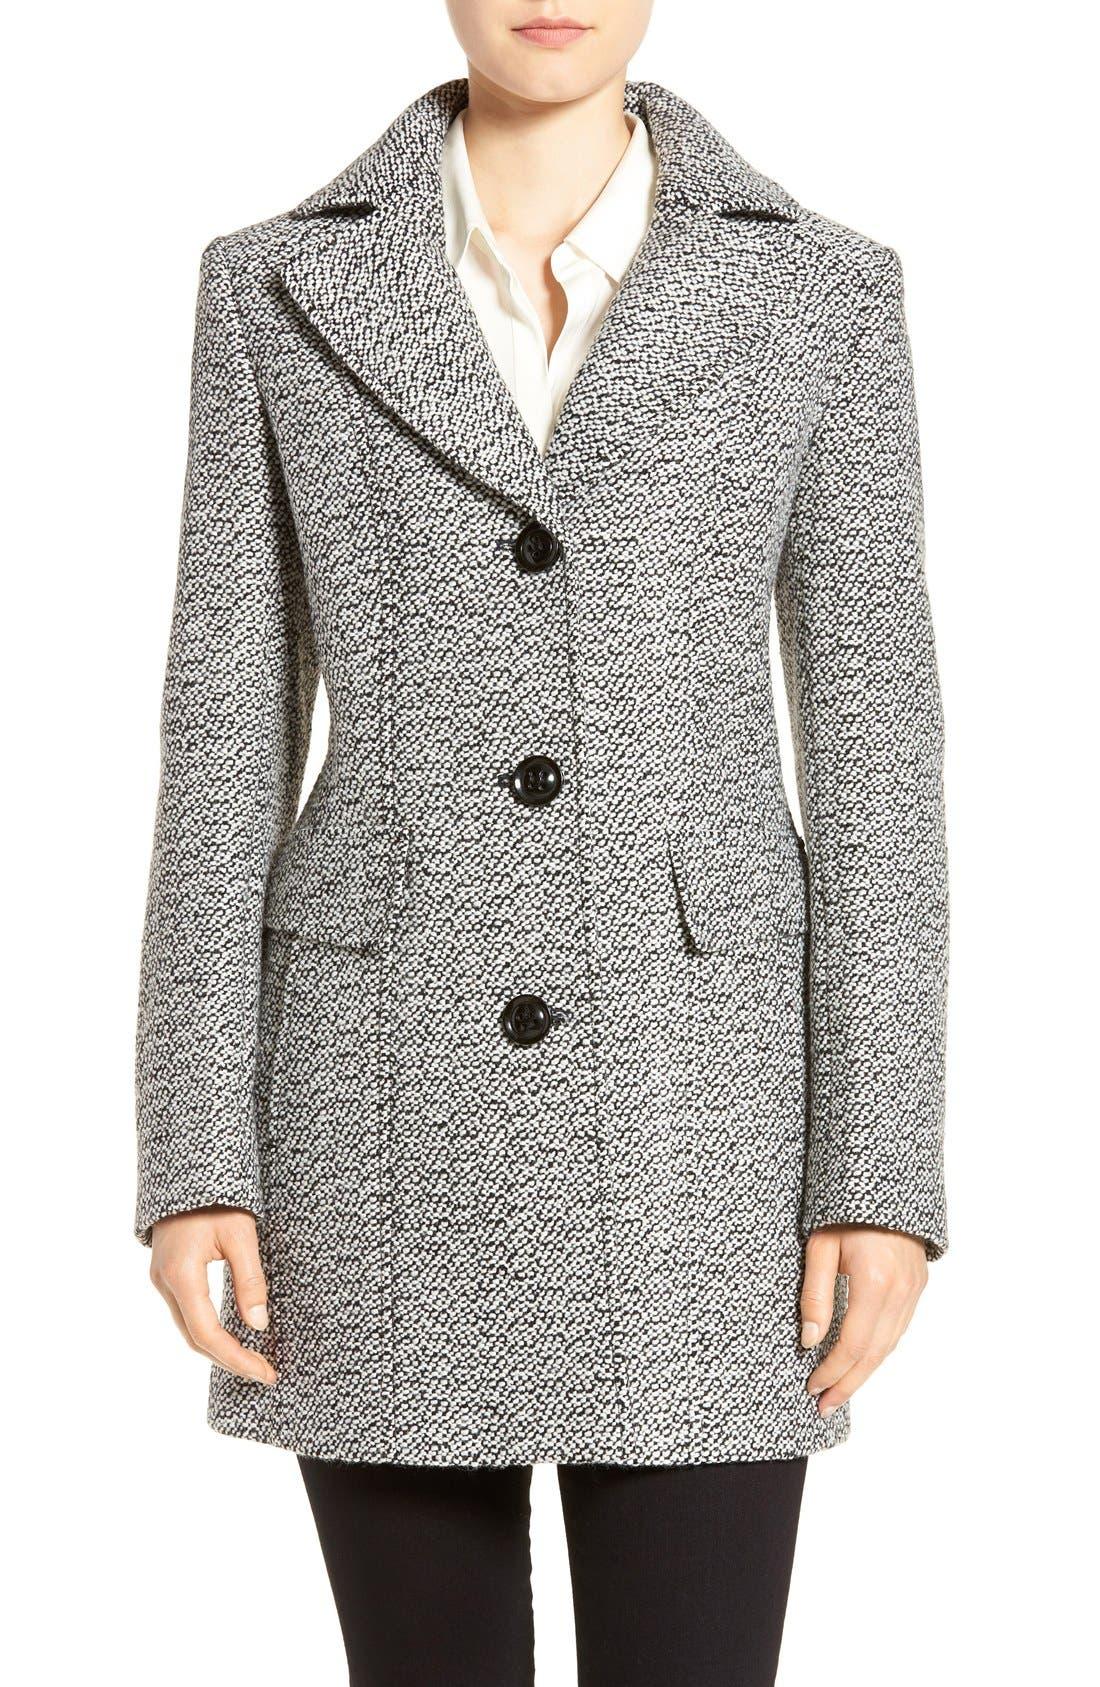 Notch Collar Tweed Coat,                         Main,                         color, White/ Black